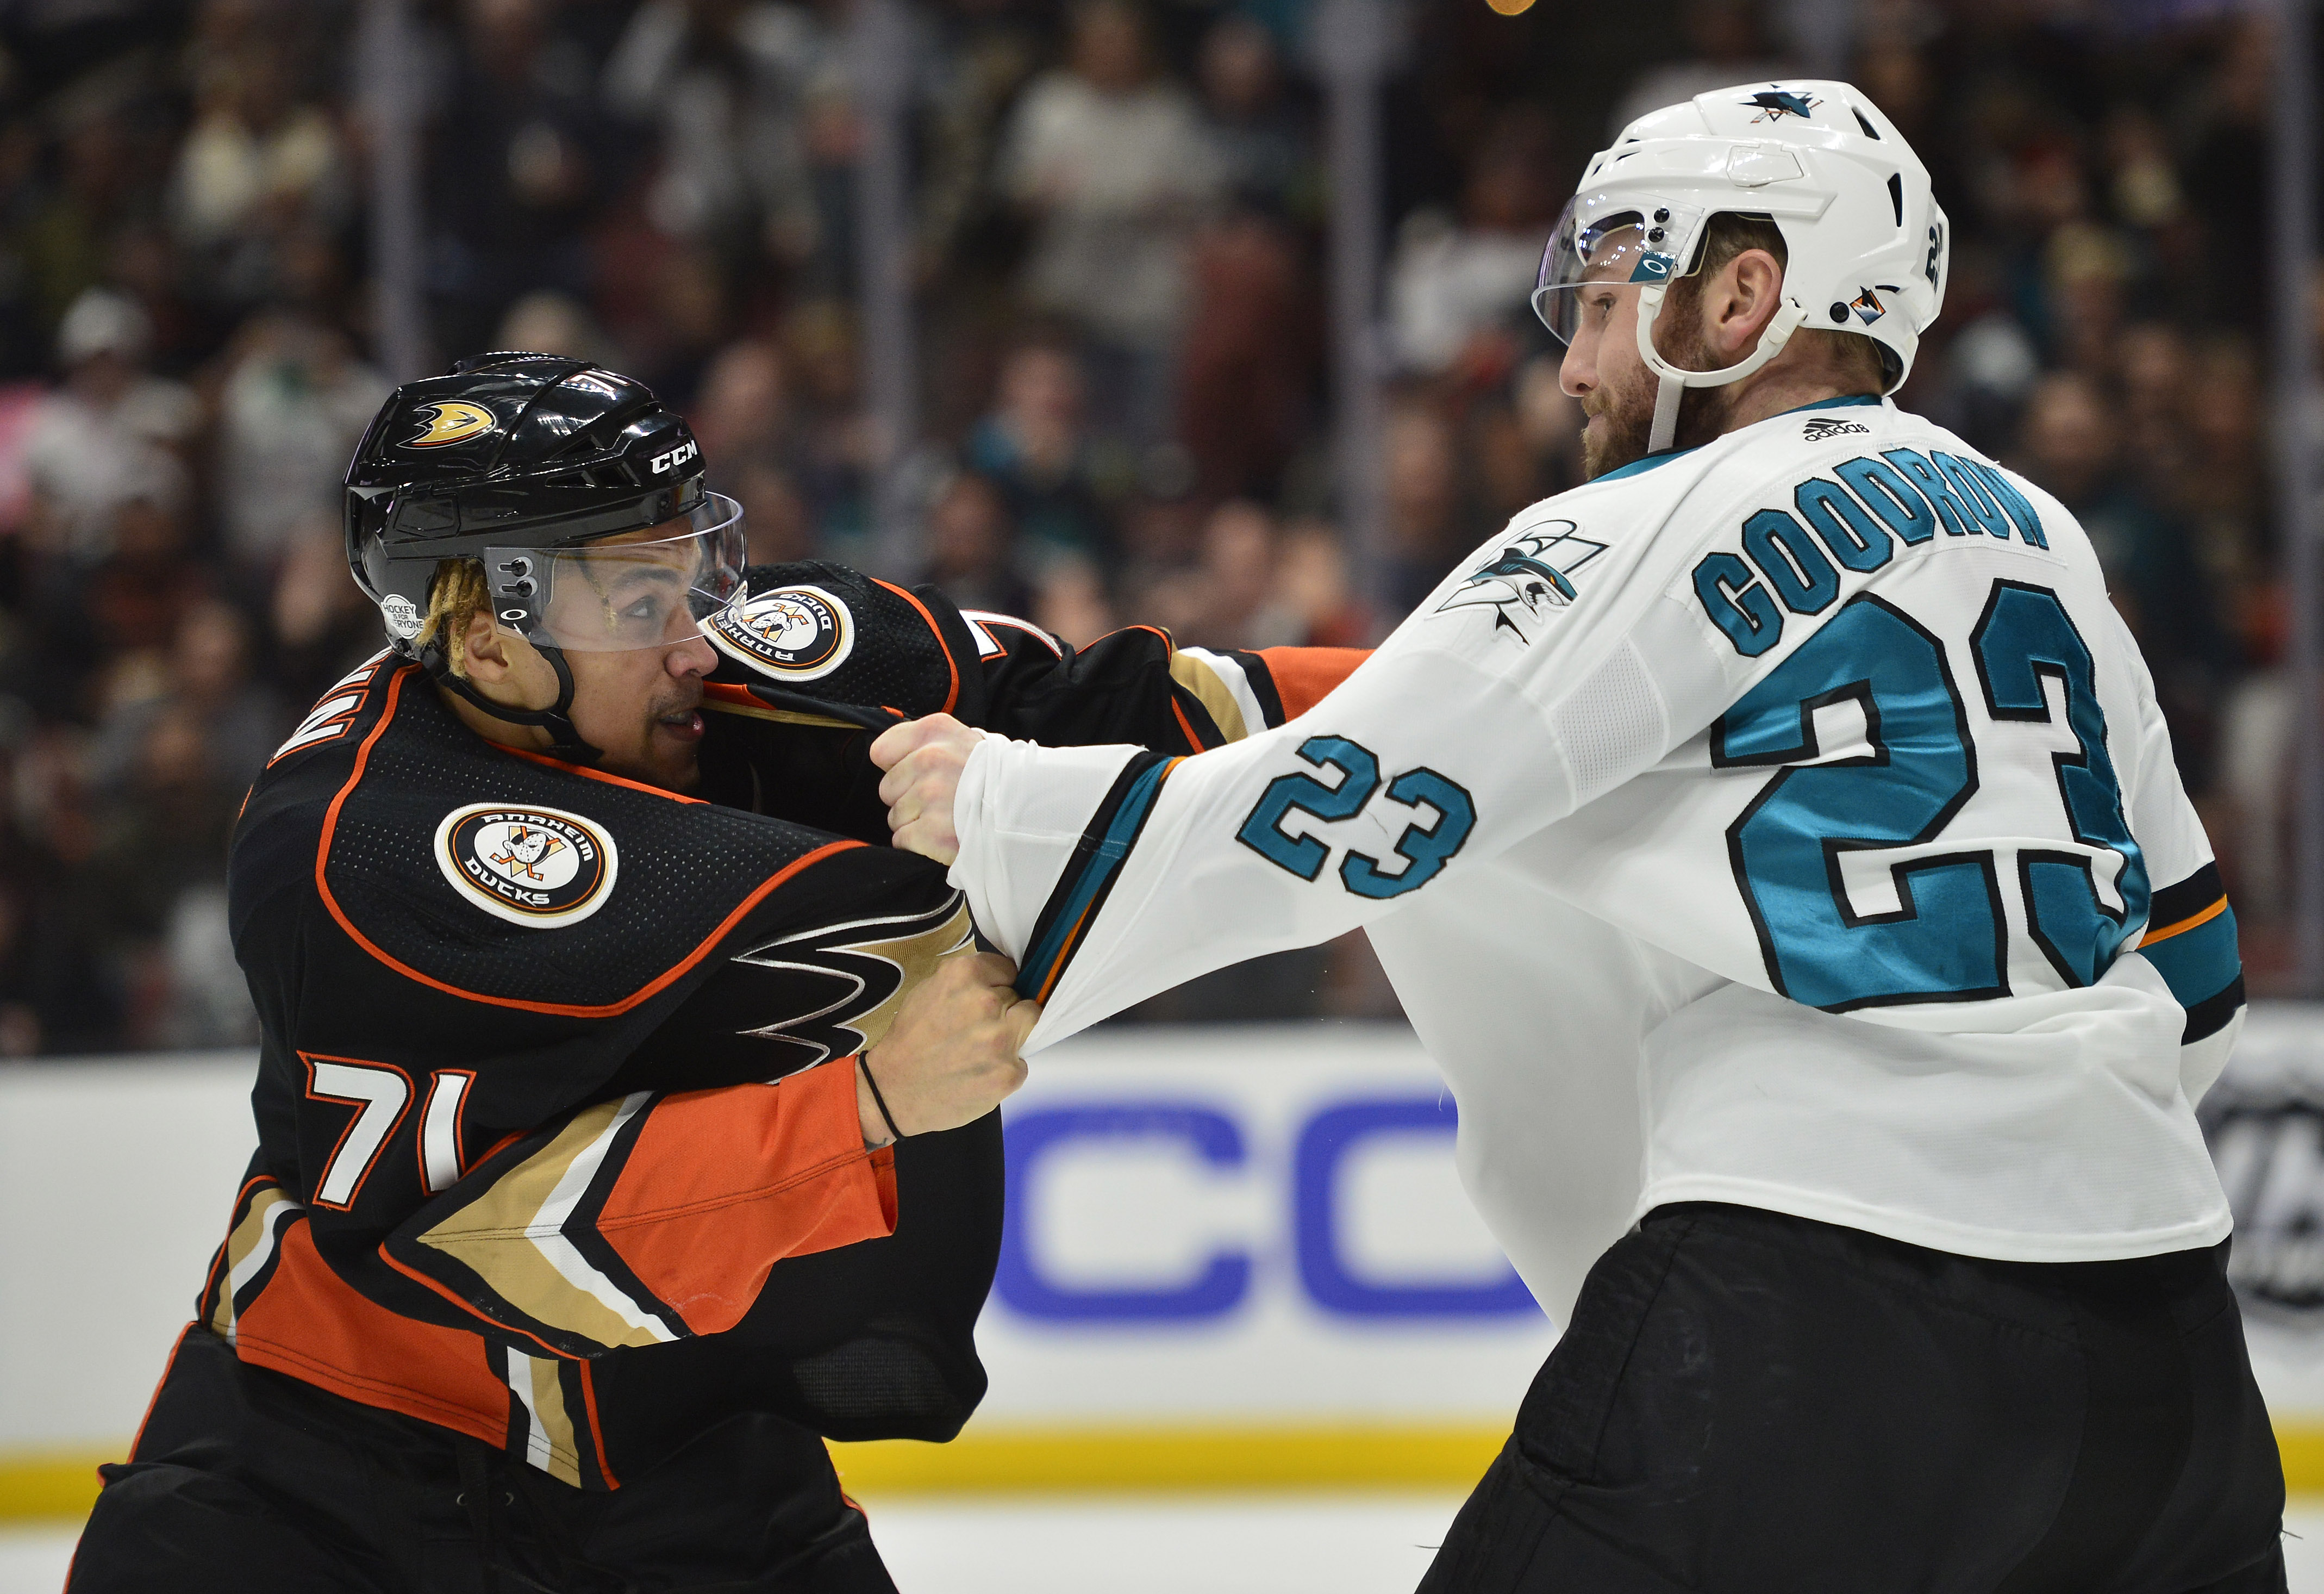 February 11, 2018; Anaheim, CA, USA; Anaheim Ducks right wing J.T. Brown (71) fights San Jose Sharks right wing Barclay Goodrow (23) at Honda Center.